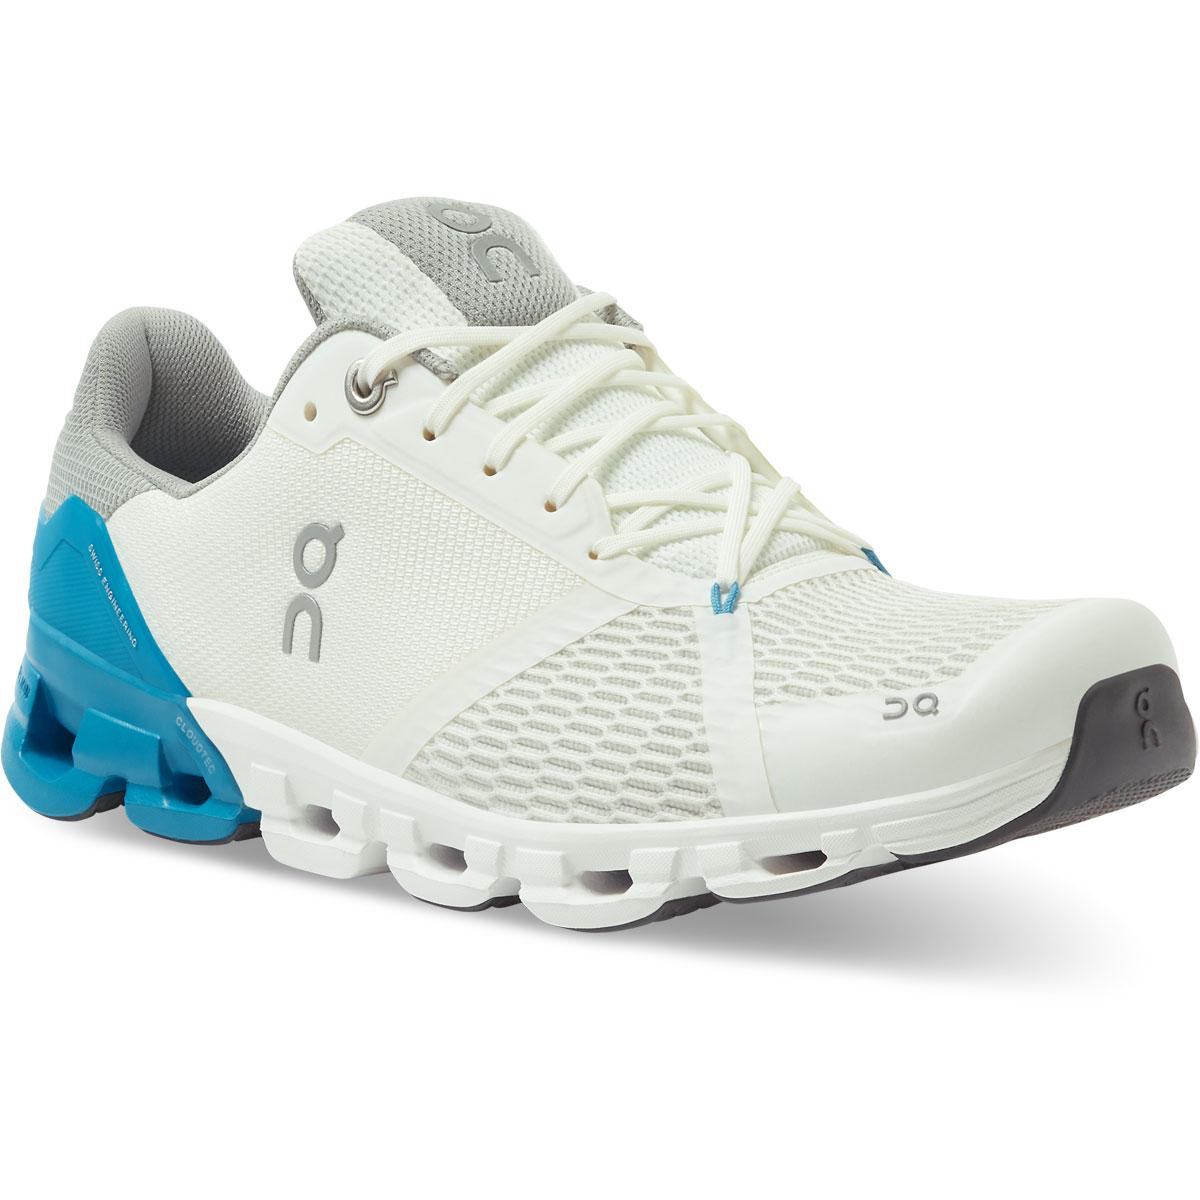 Men's On Cloudflyer 2.0 Running Shoe - Color: White/Blue - Size: 7 - Width: Regular, White/Blue, large, image 2